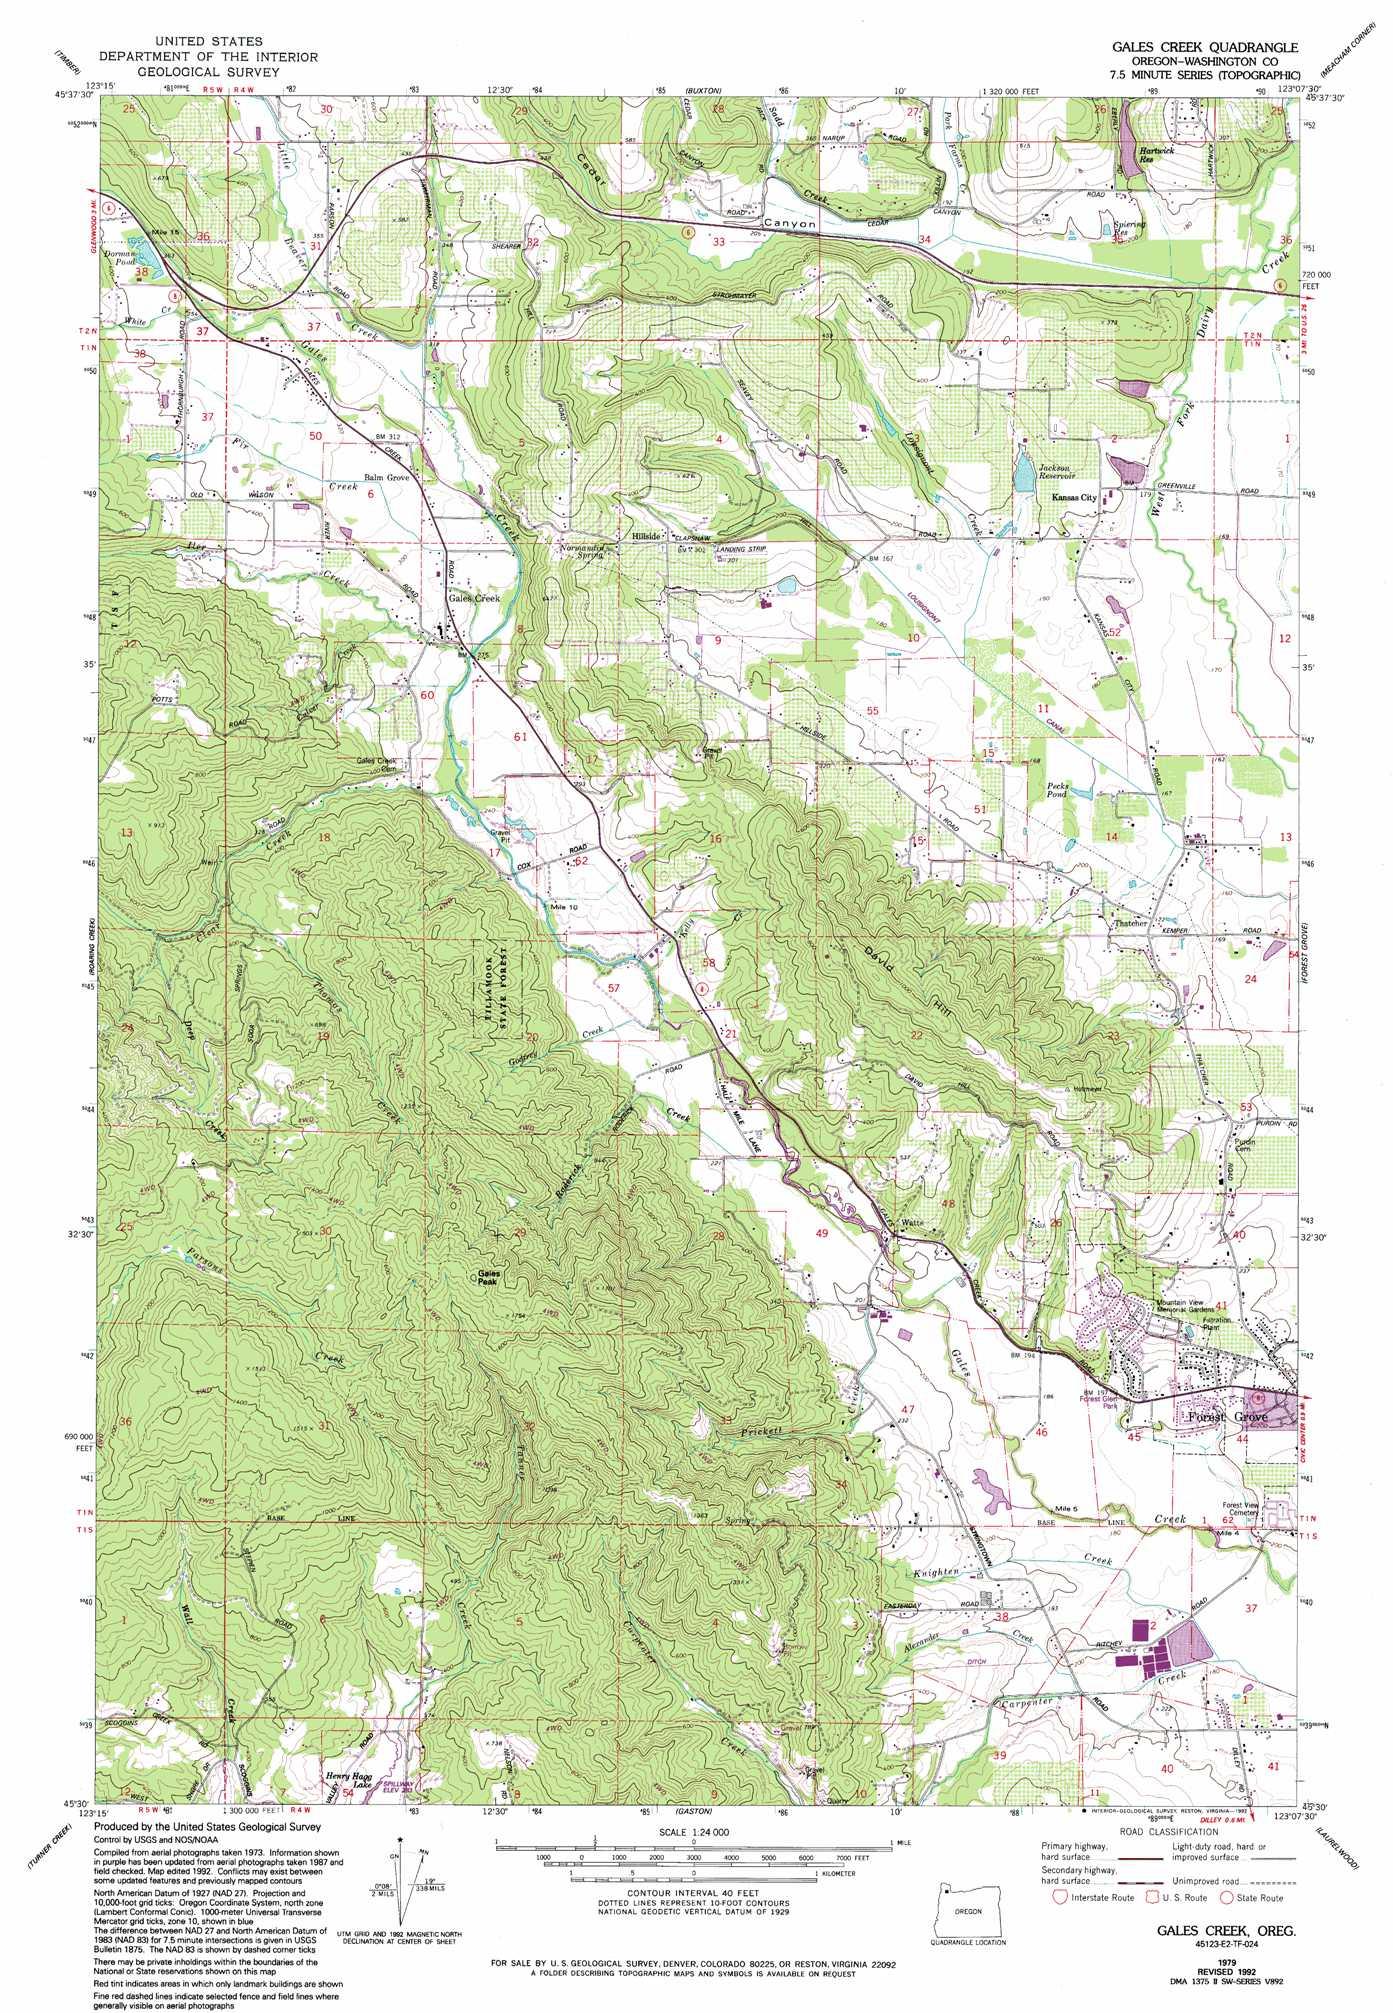 gales creek oregon map Gales Creek Topographic Map Or Usgs Topo Quad 45123e2 gales creek oregon map